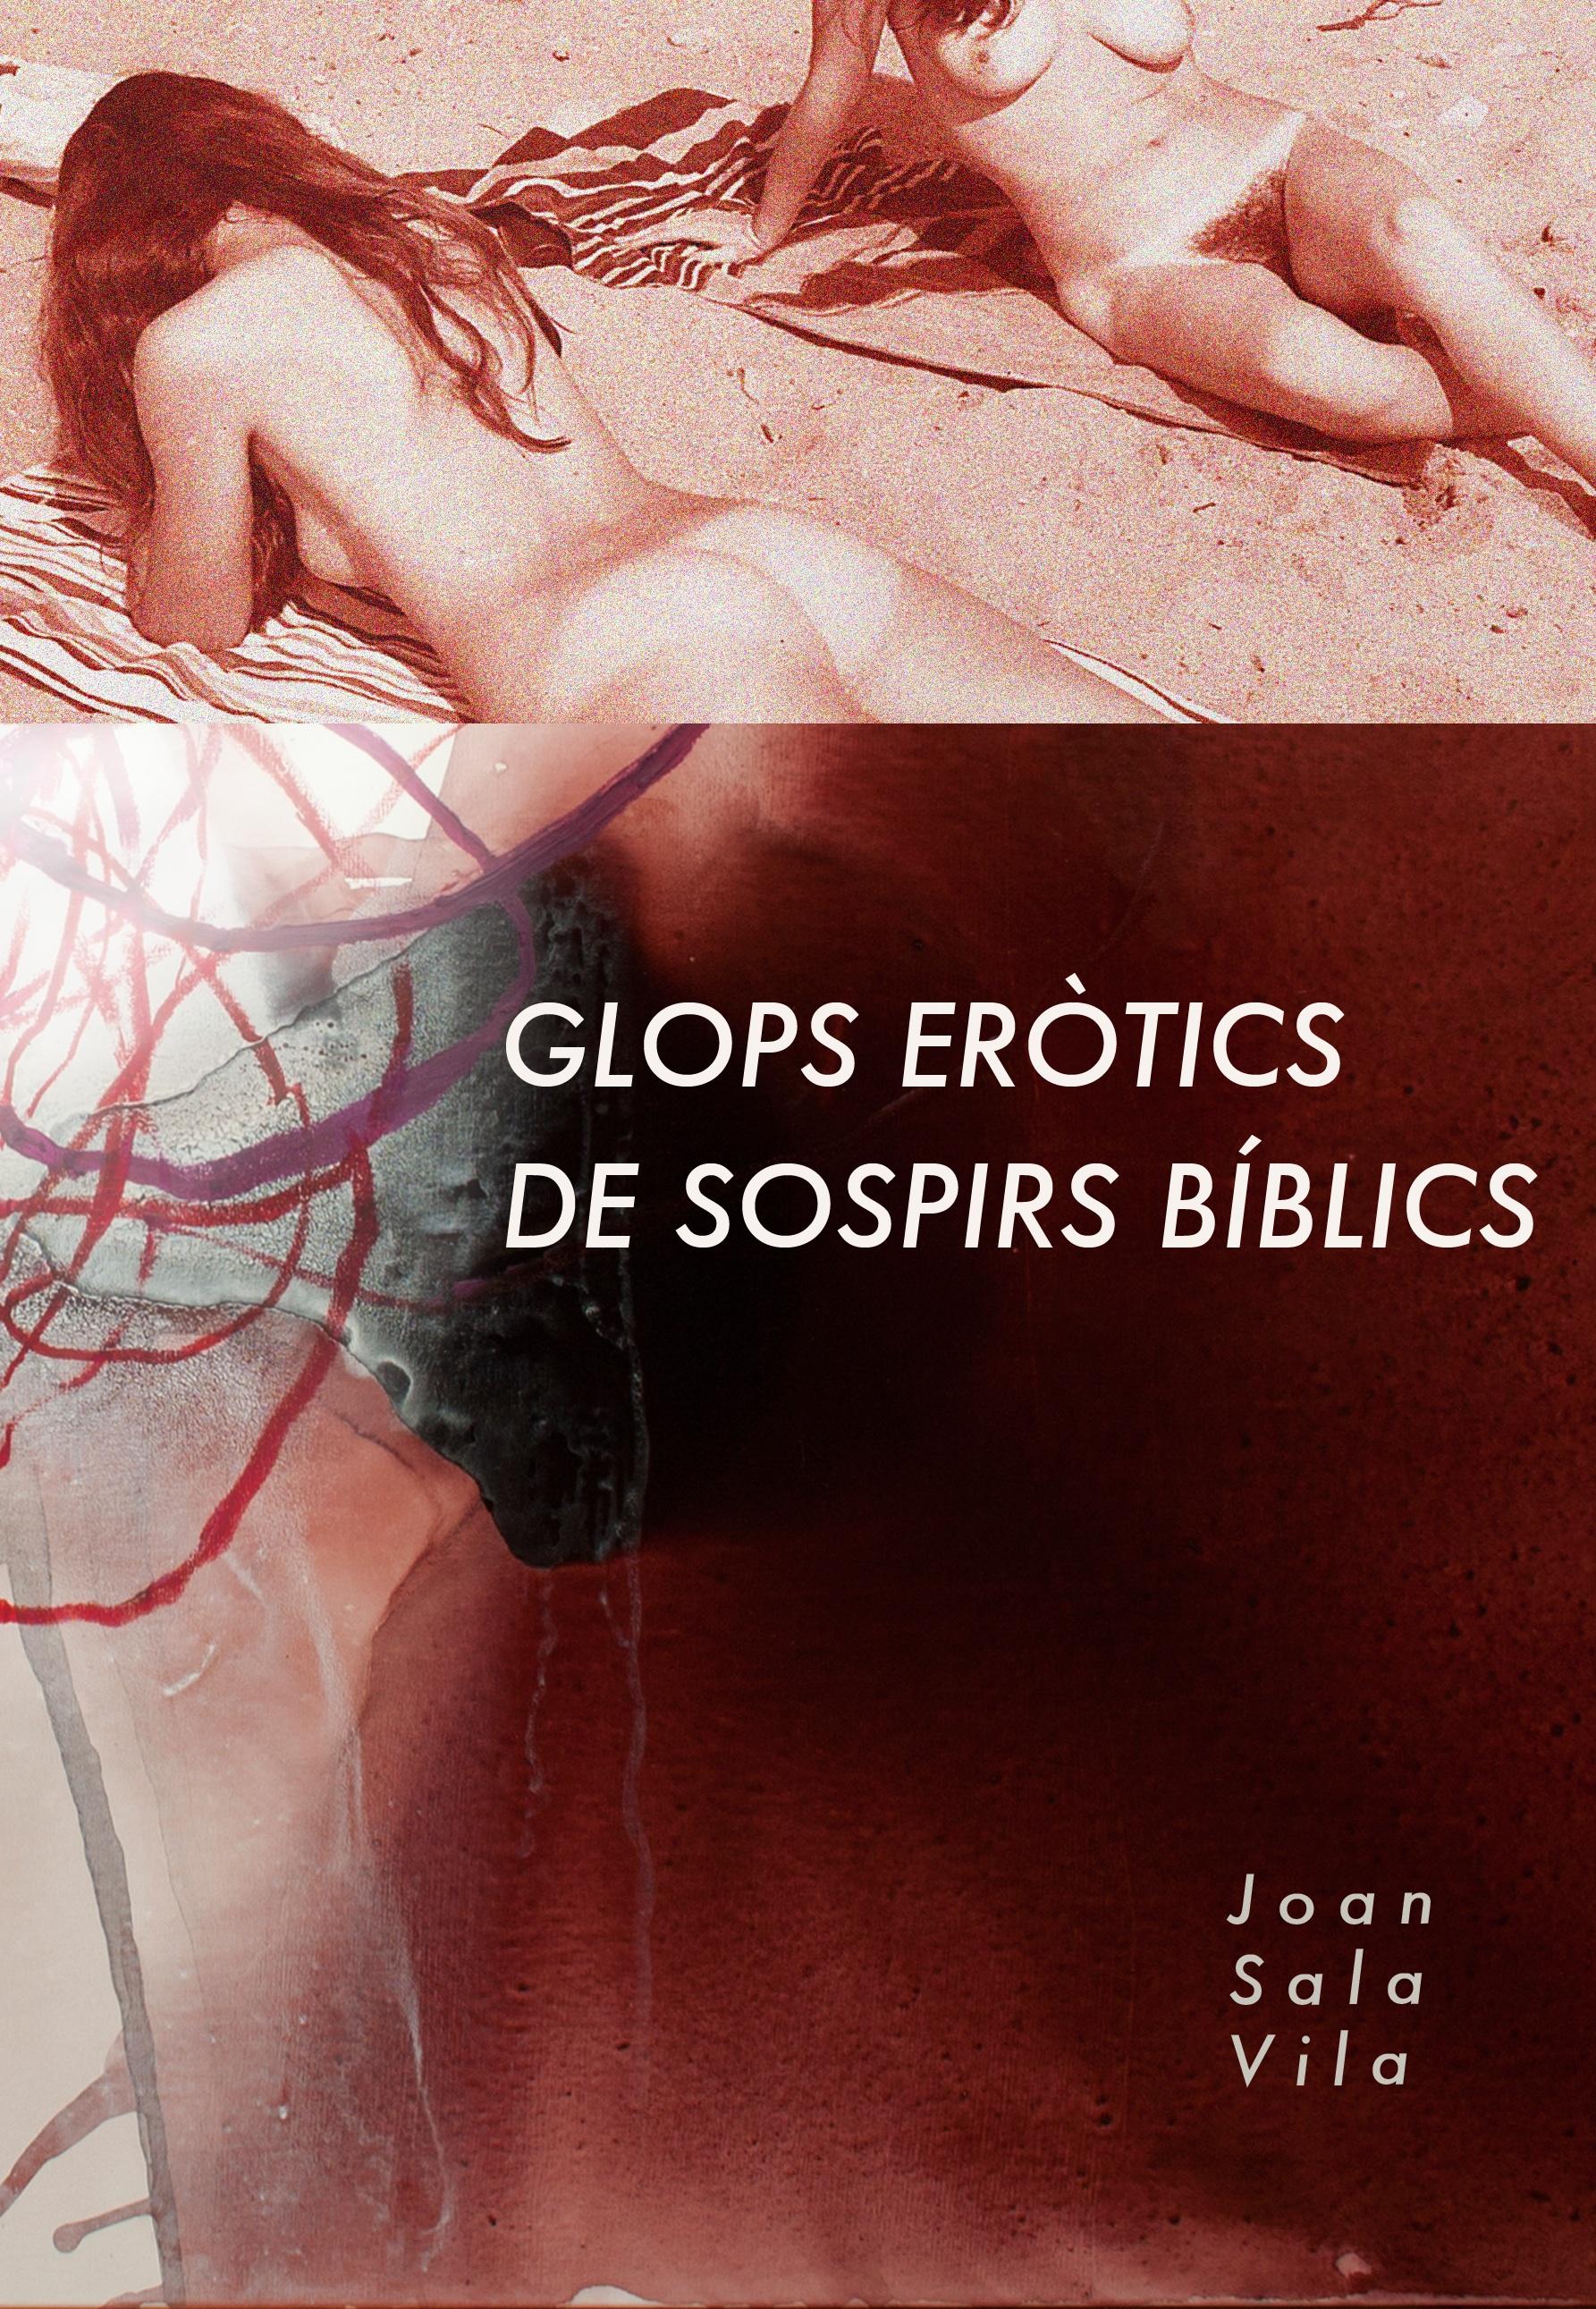 glops_eroietics_de_sospirs_bii-blics-1